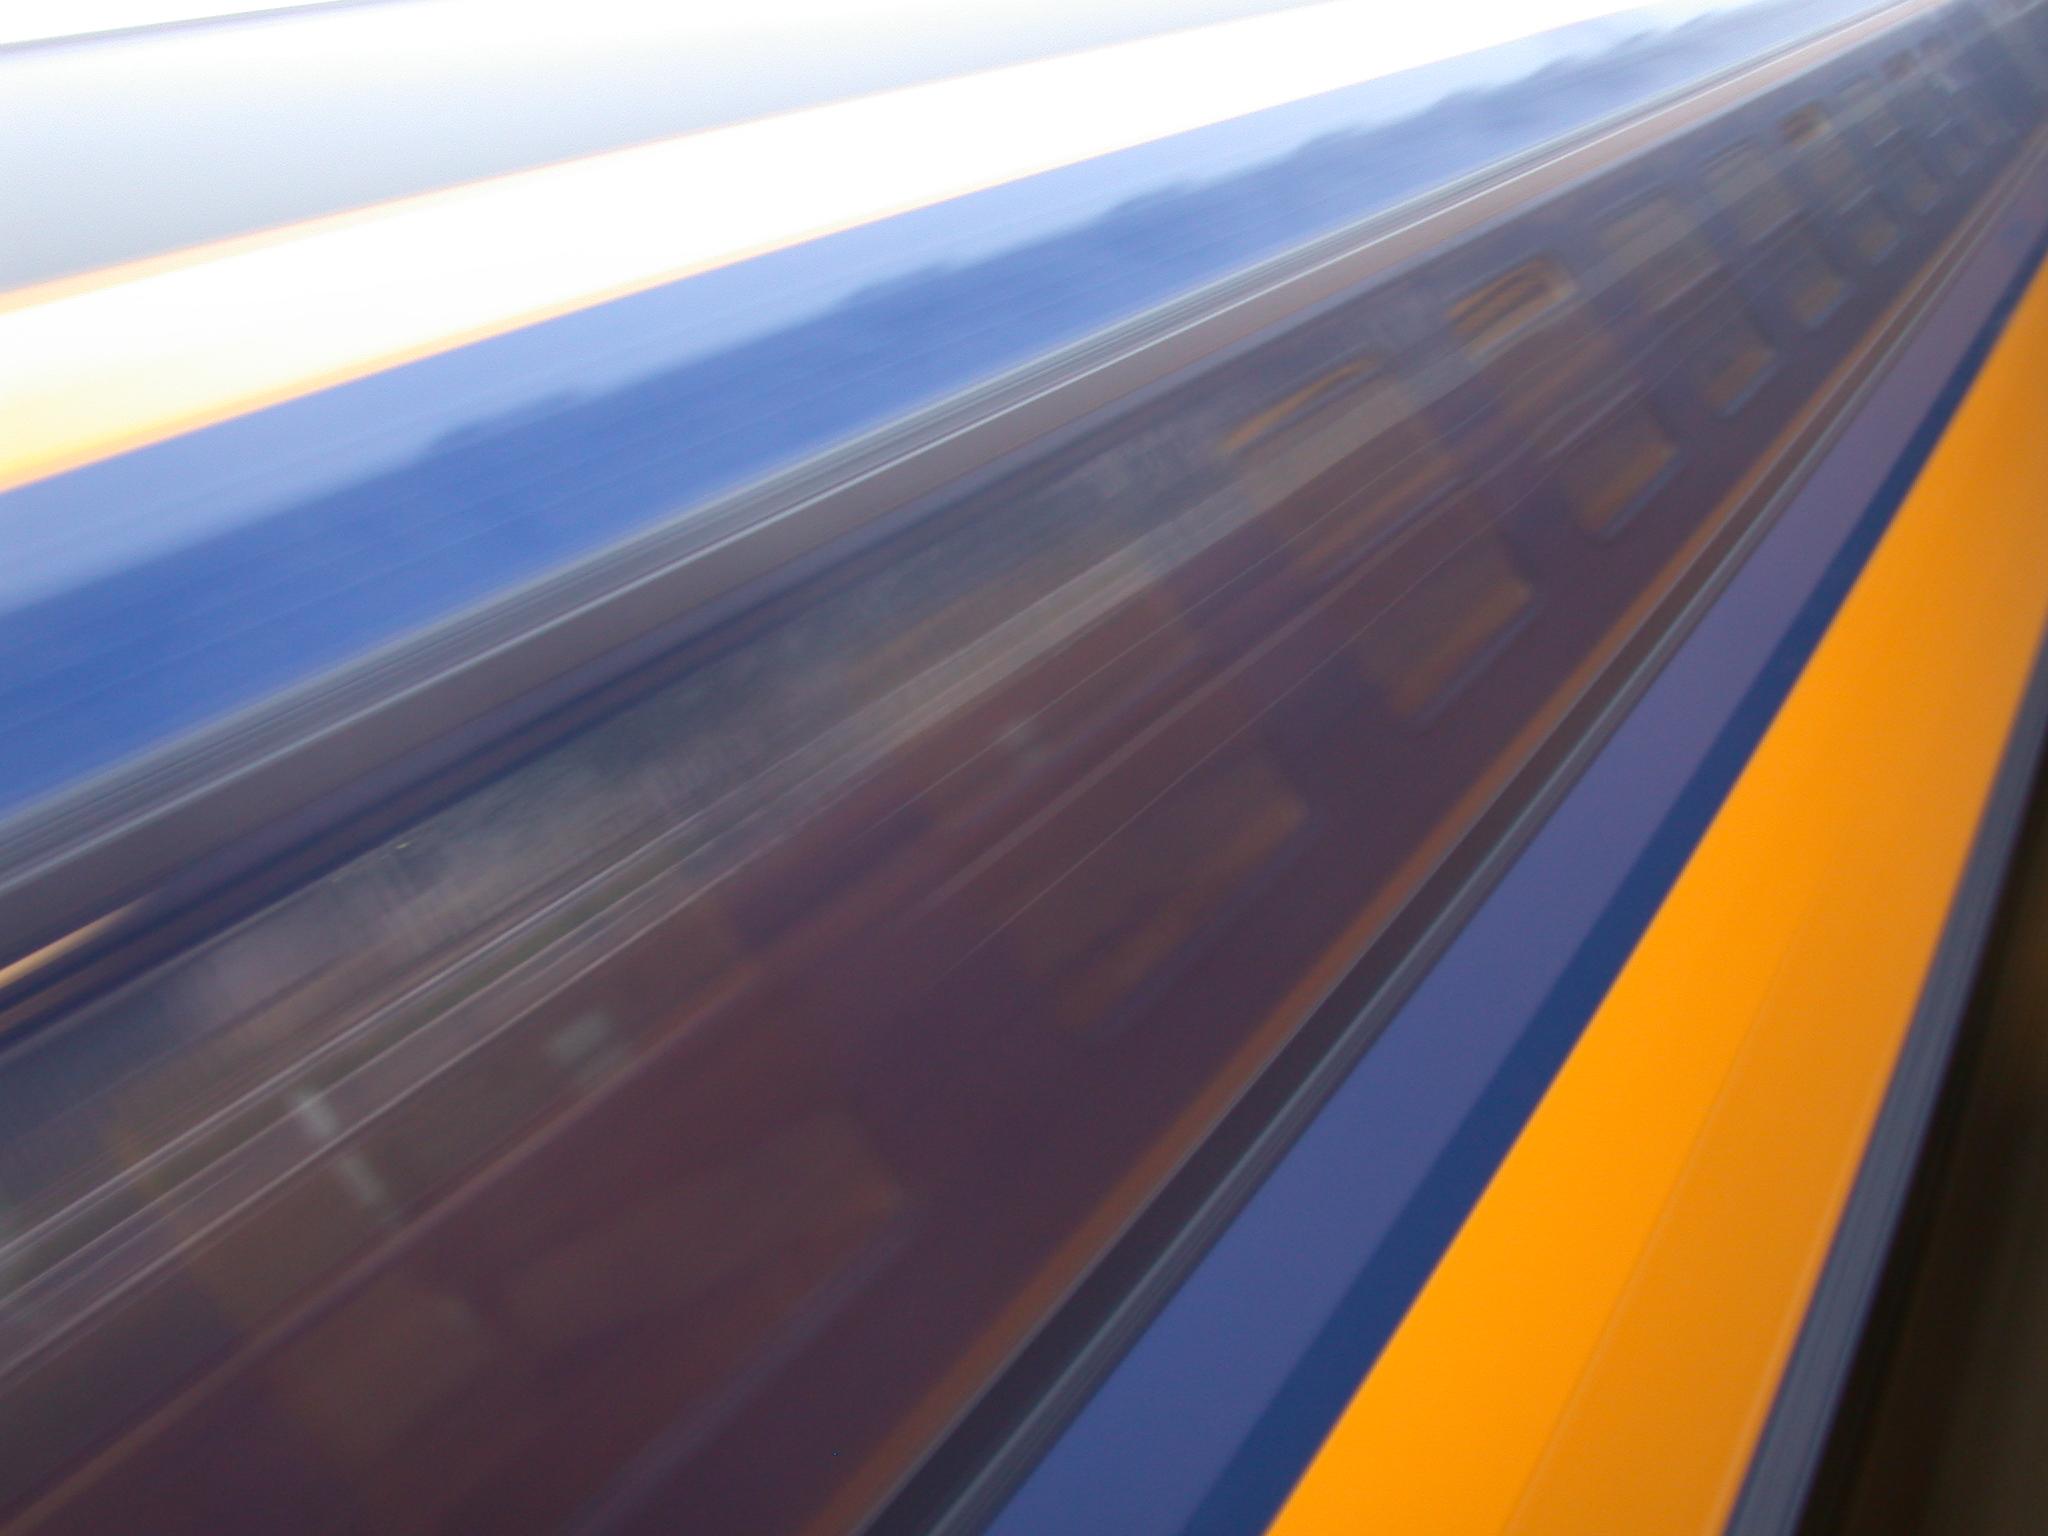 train traffic speed blur blurs blue yellow diagonal dutch vehicles land